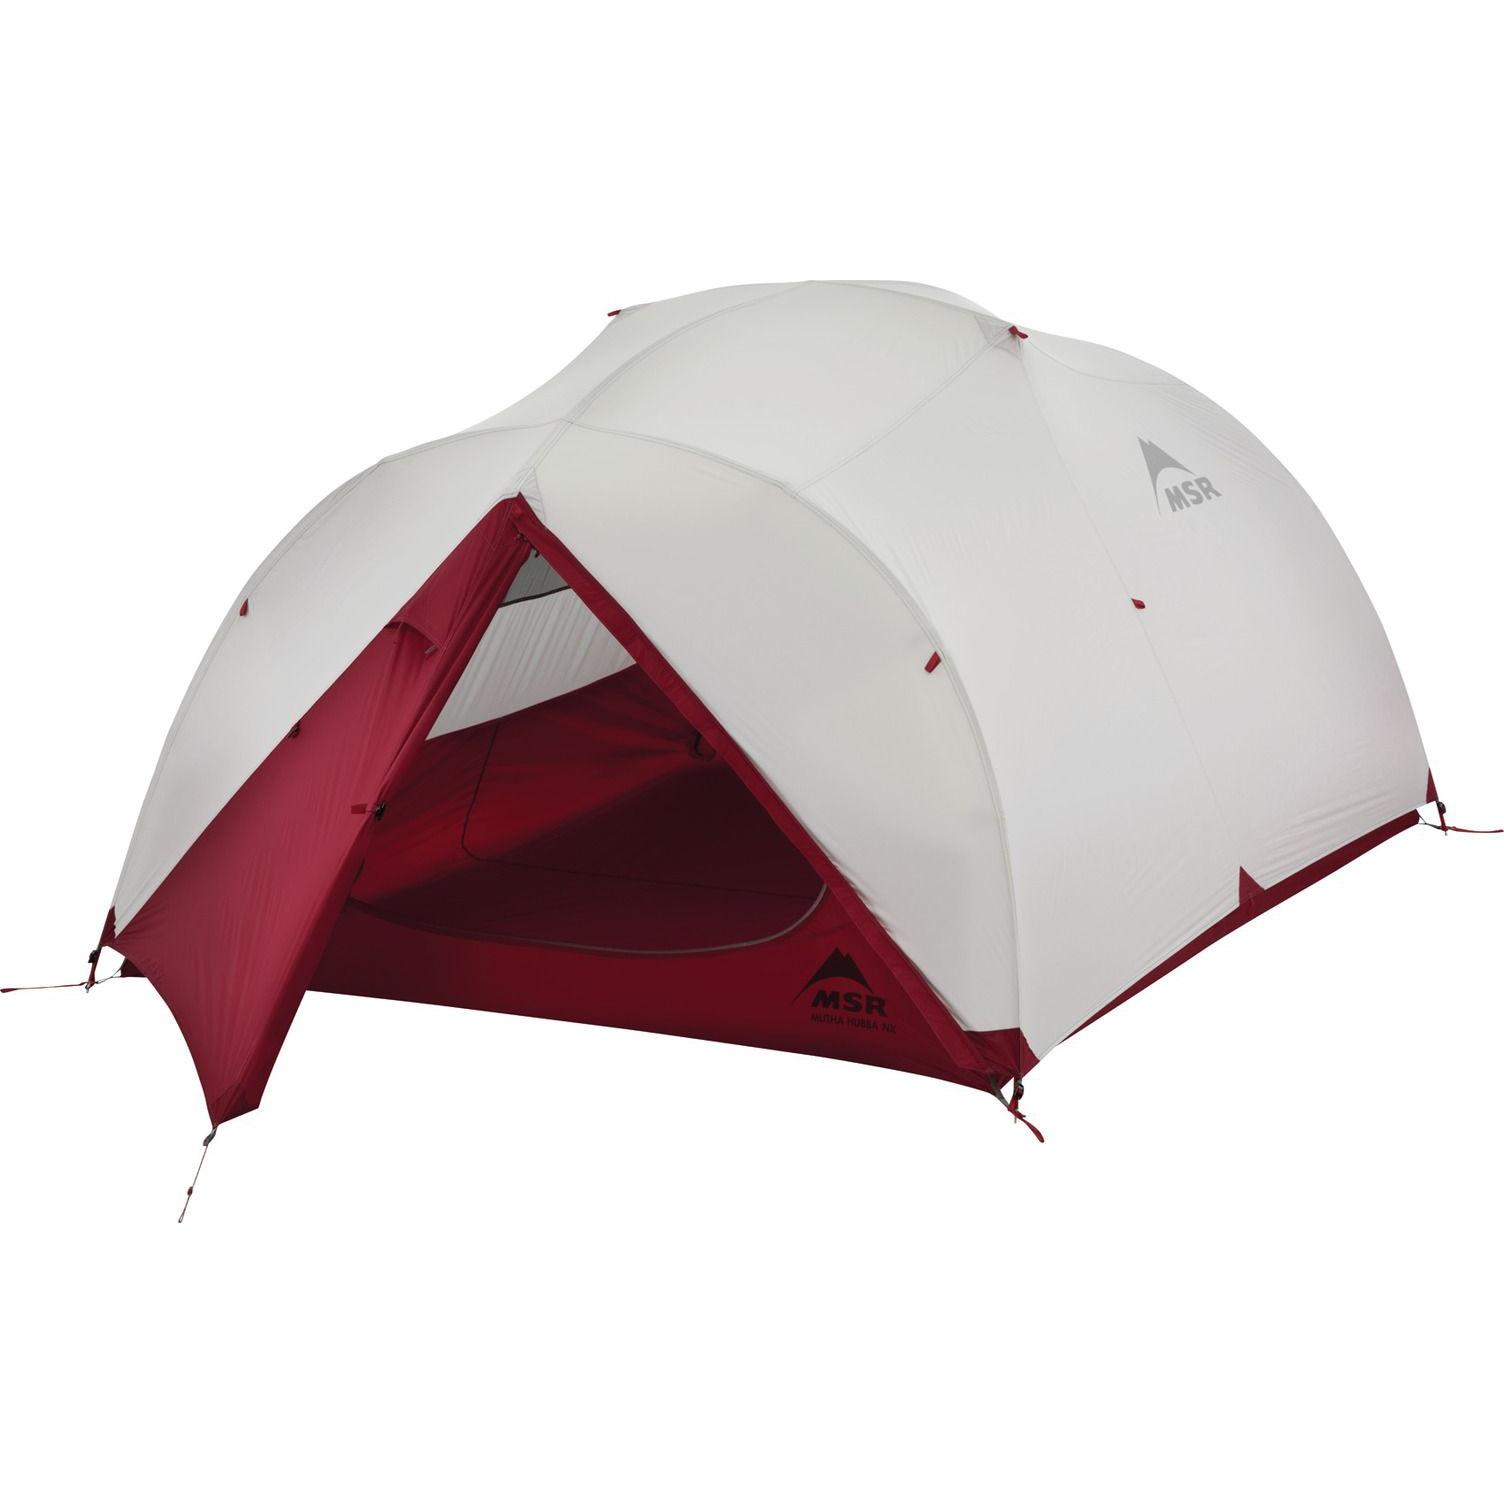 Mutha Hubba NX Tent V6